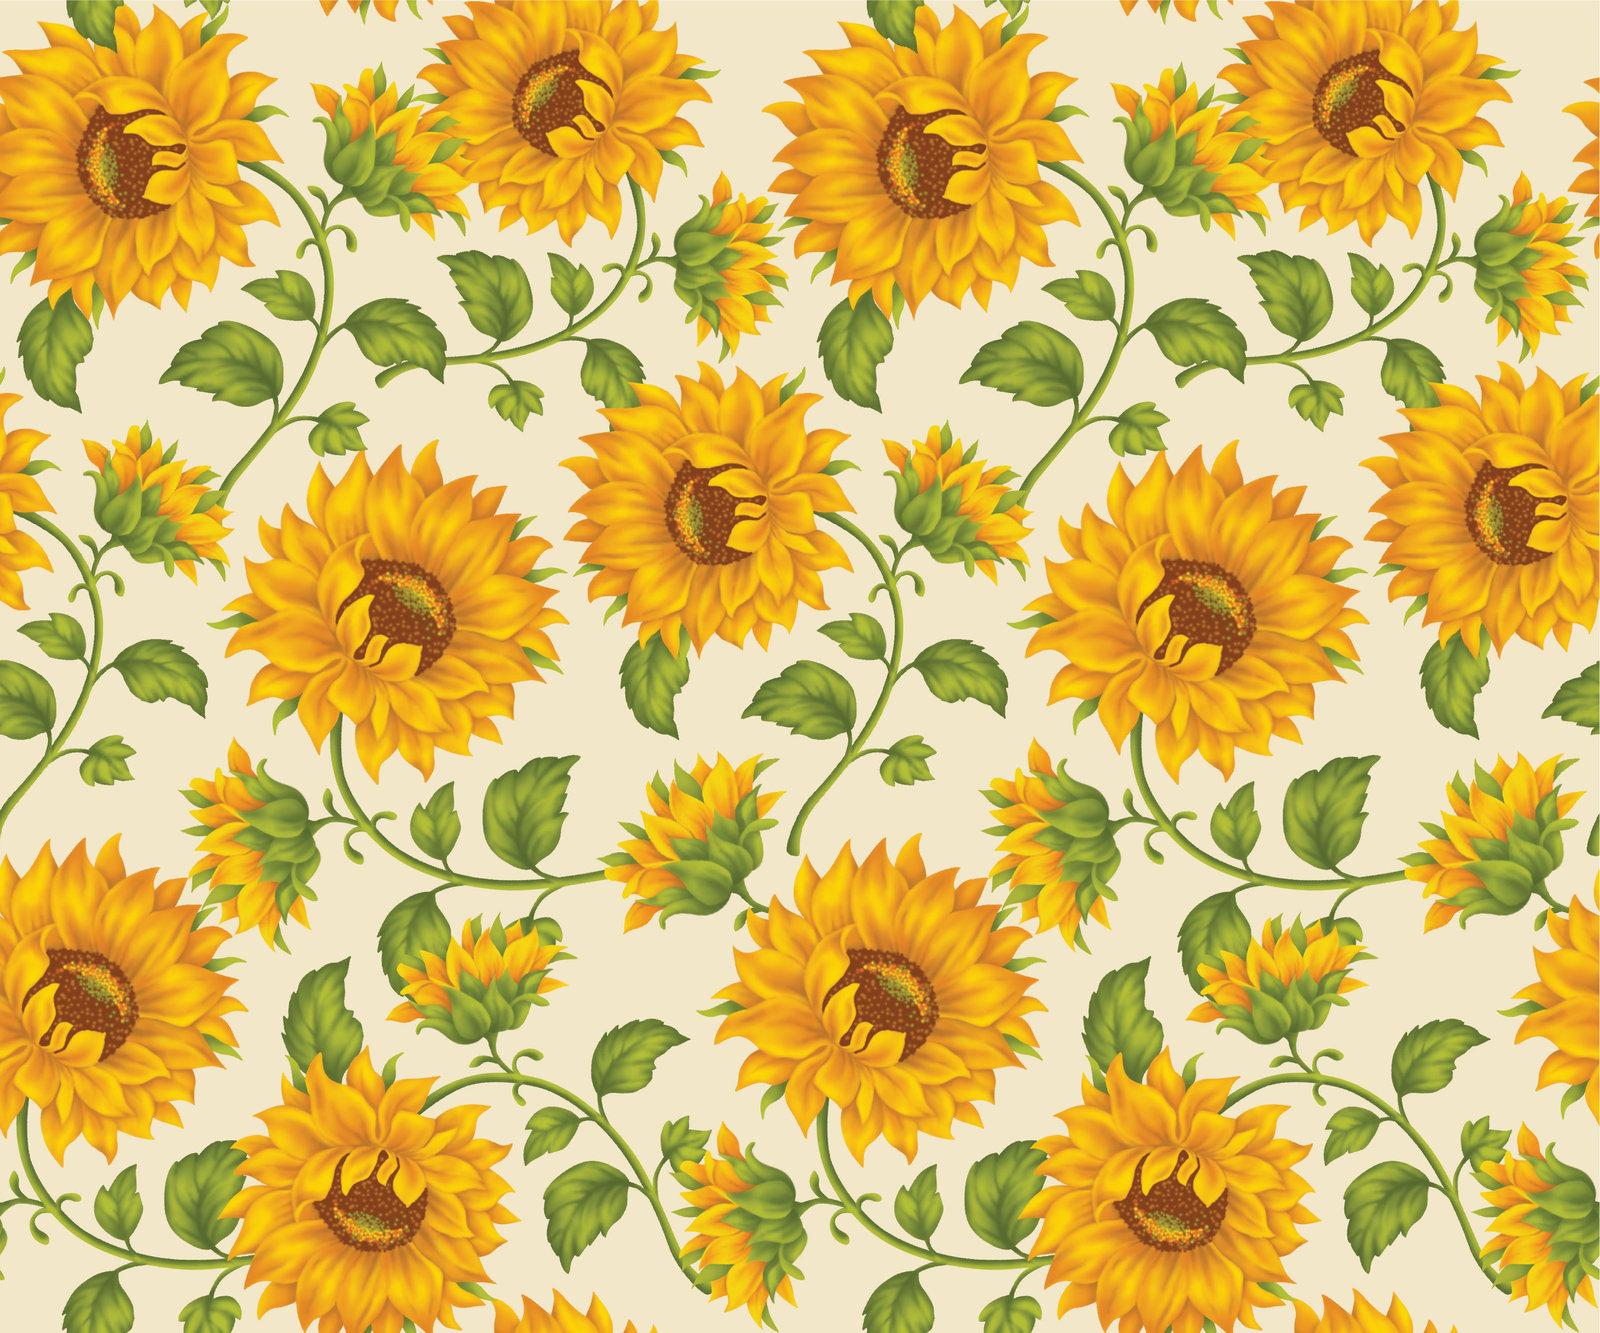 Wallpaper clipart sunflower Sunflower Ivory Background DeviantArt on